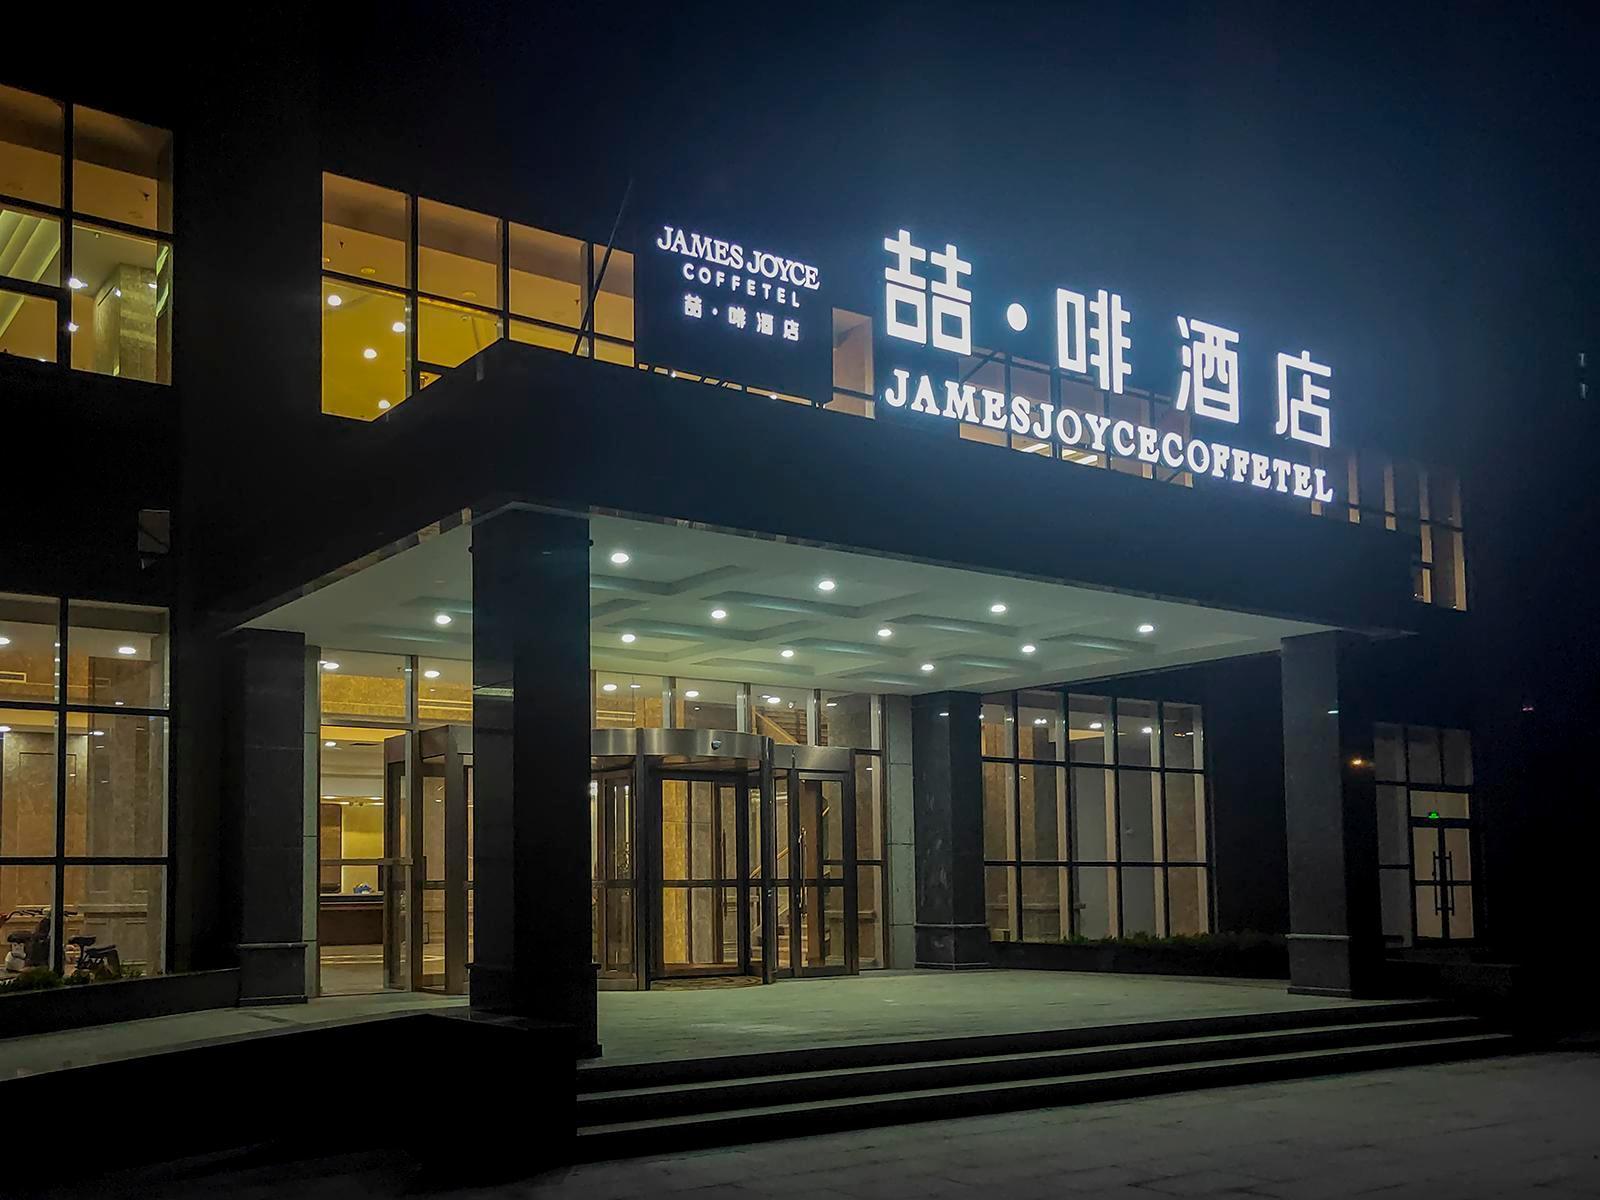 James Joyce Coffetel Xinji International Leather Trade Mall